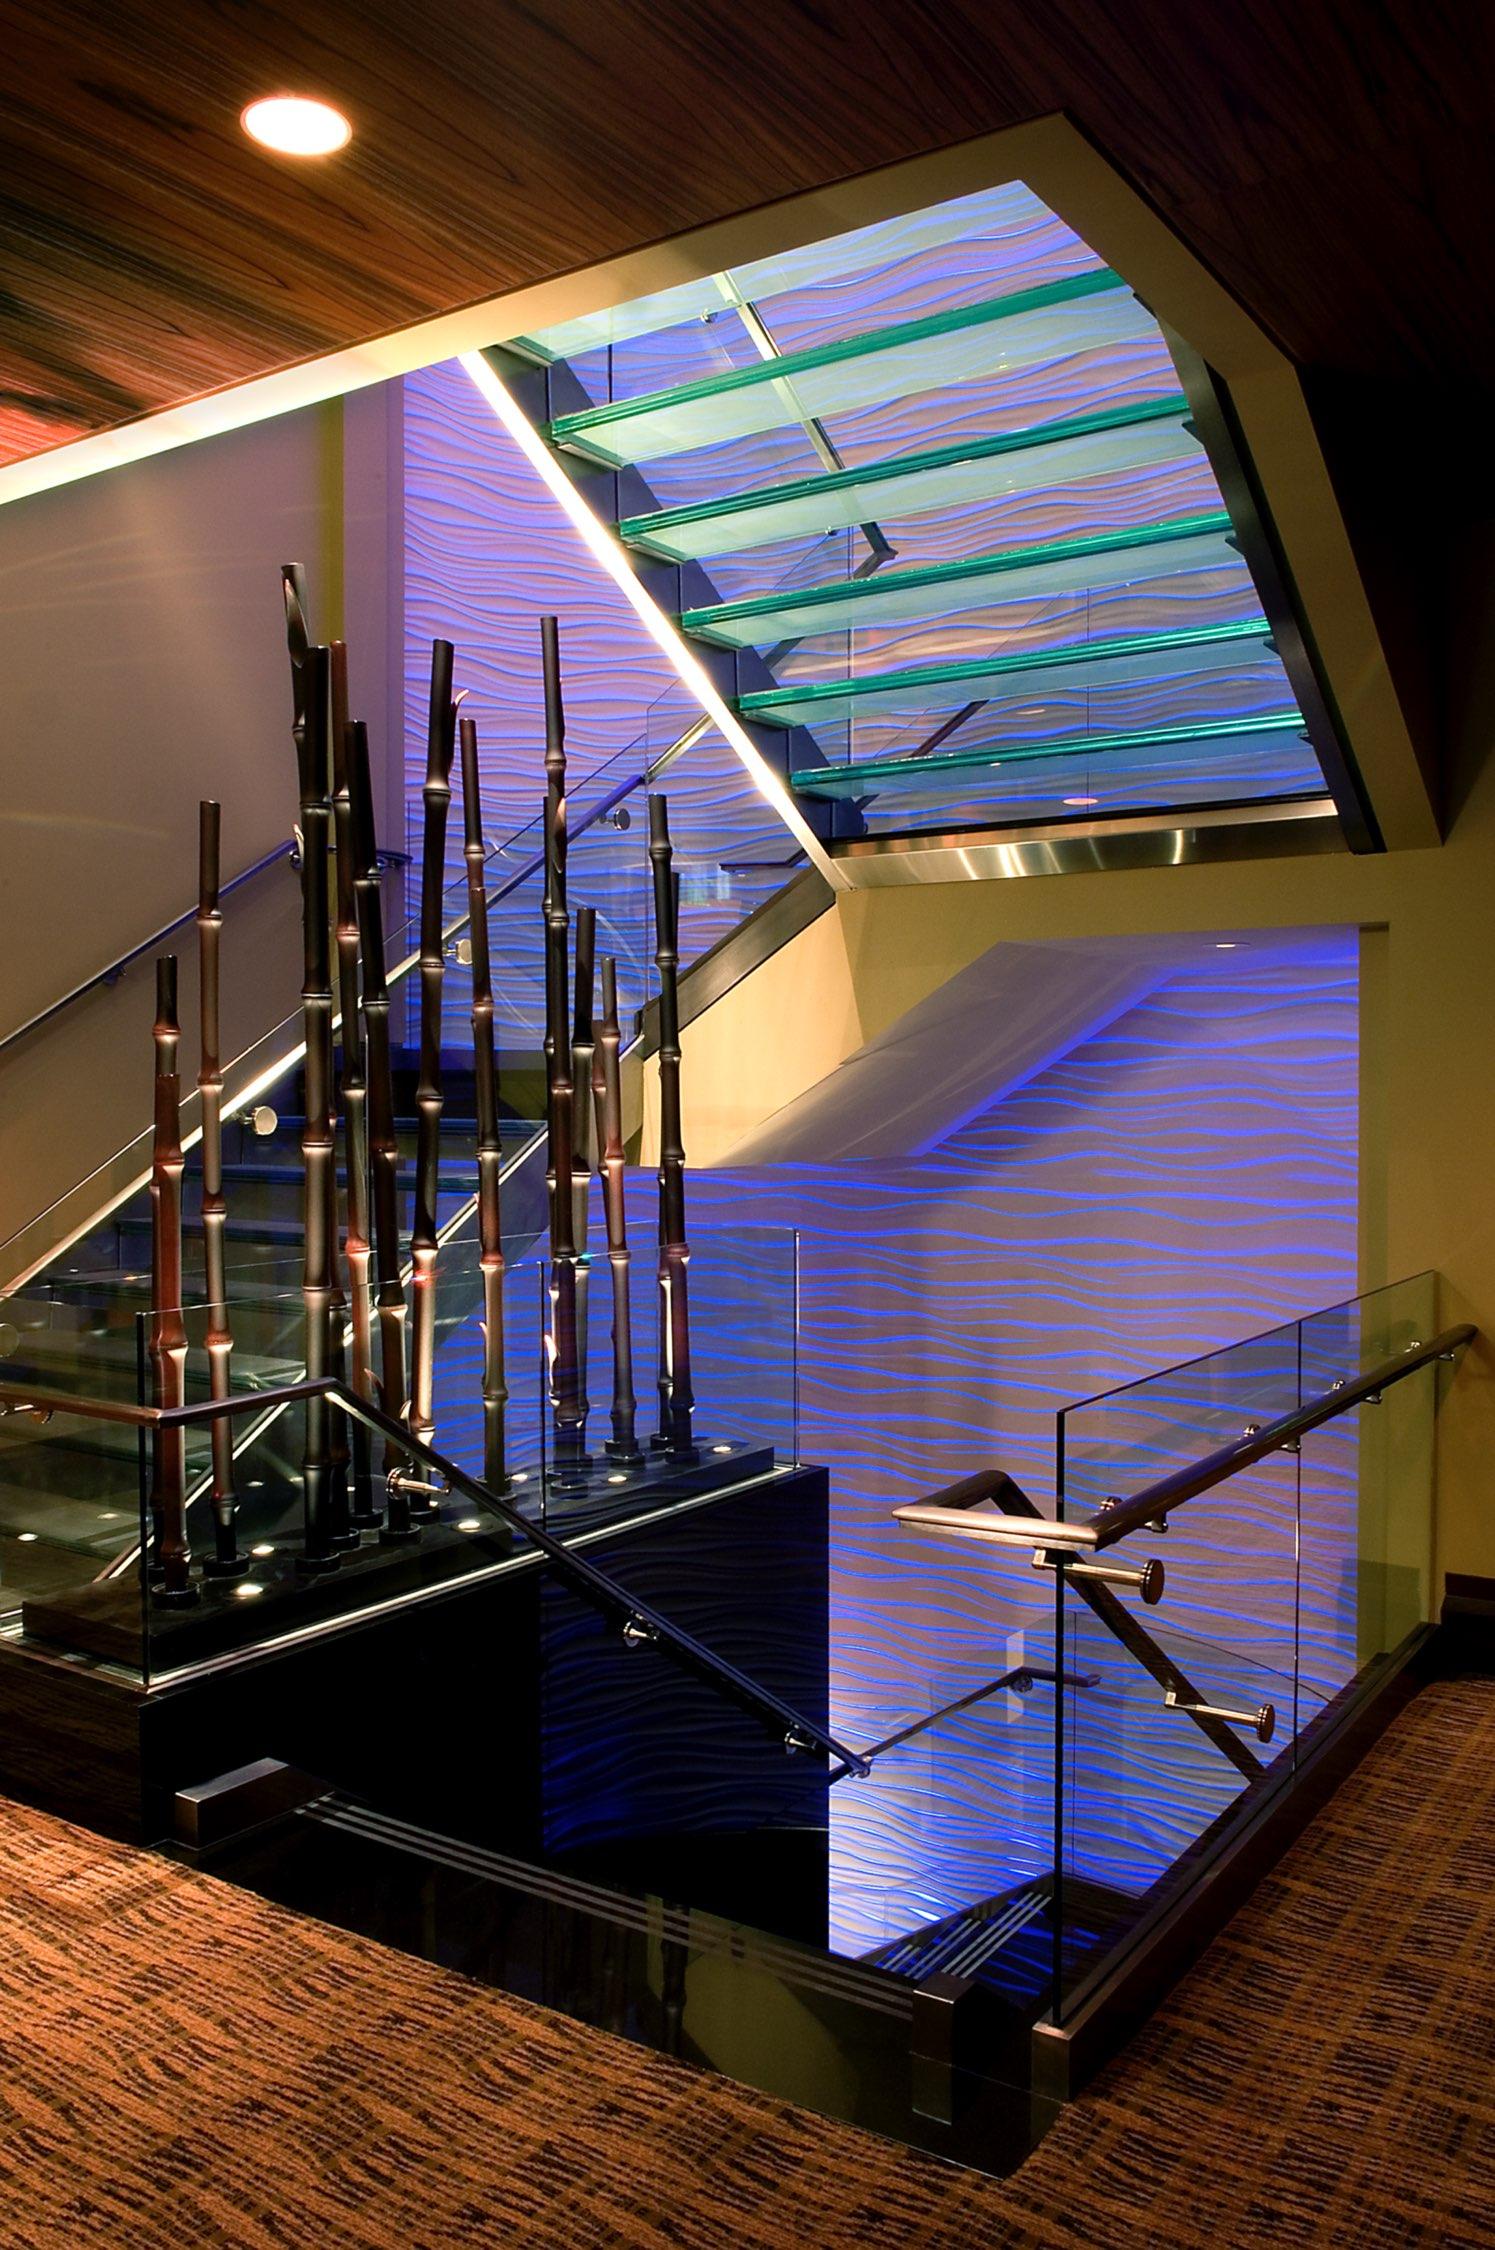 Hotel-1000-Studio-Lux-Lighting-1